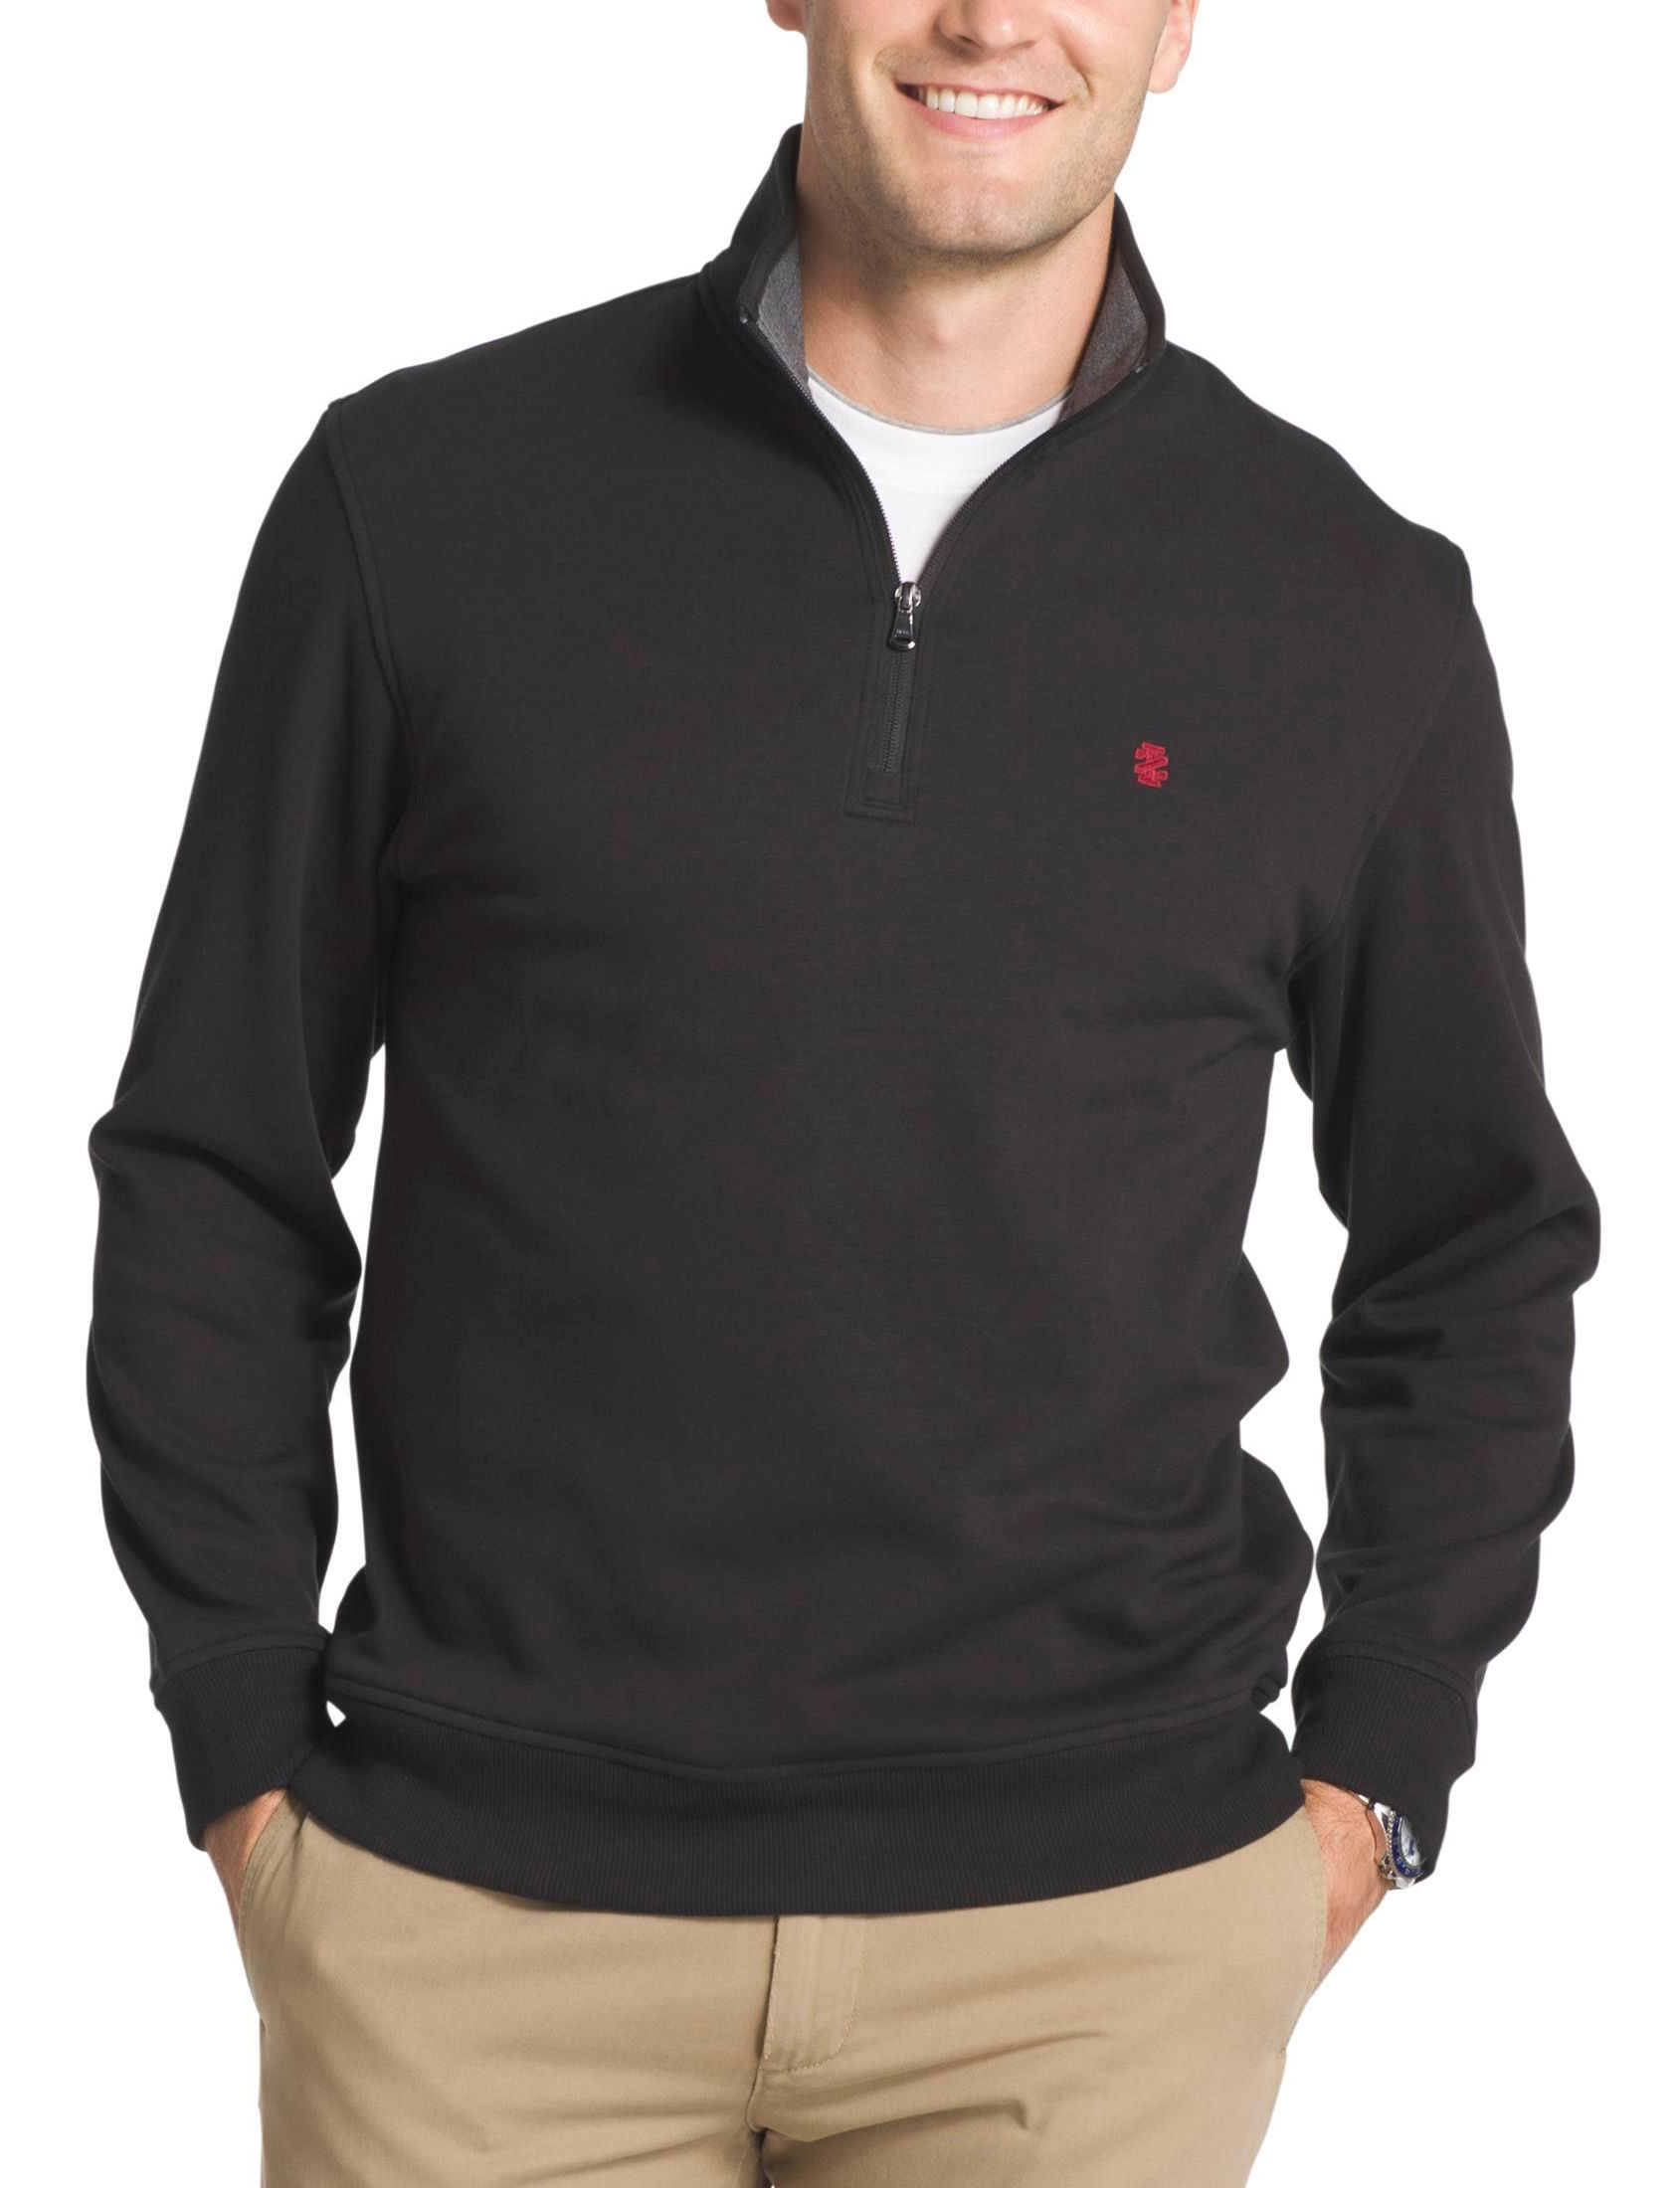 Izod Black Fleece & Soft Shell Jackets